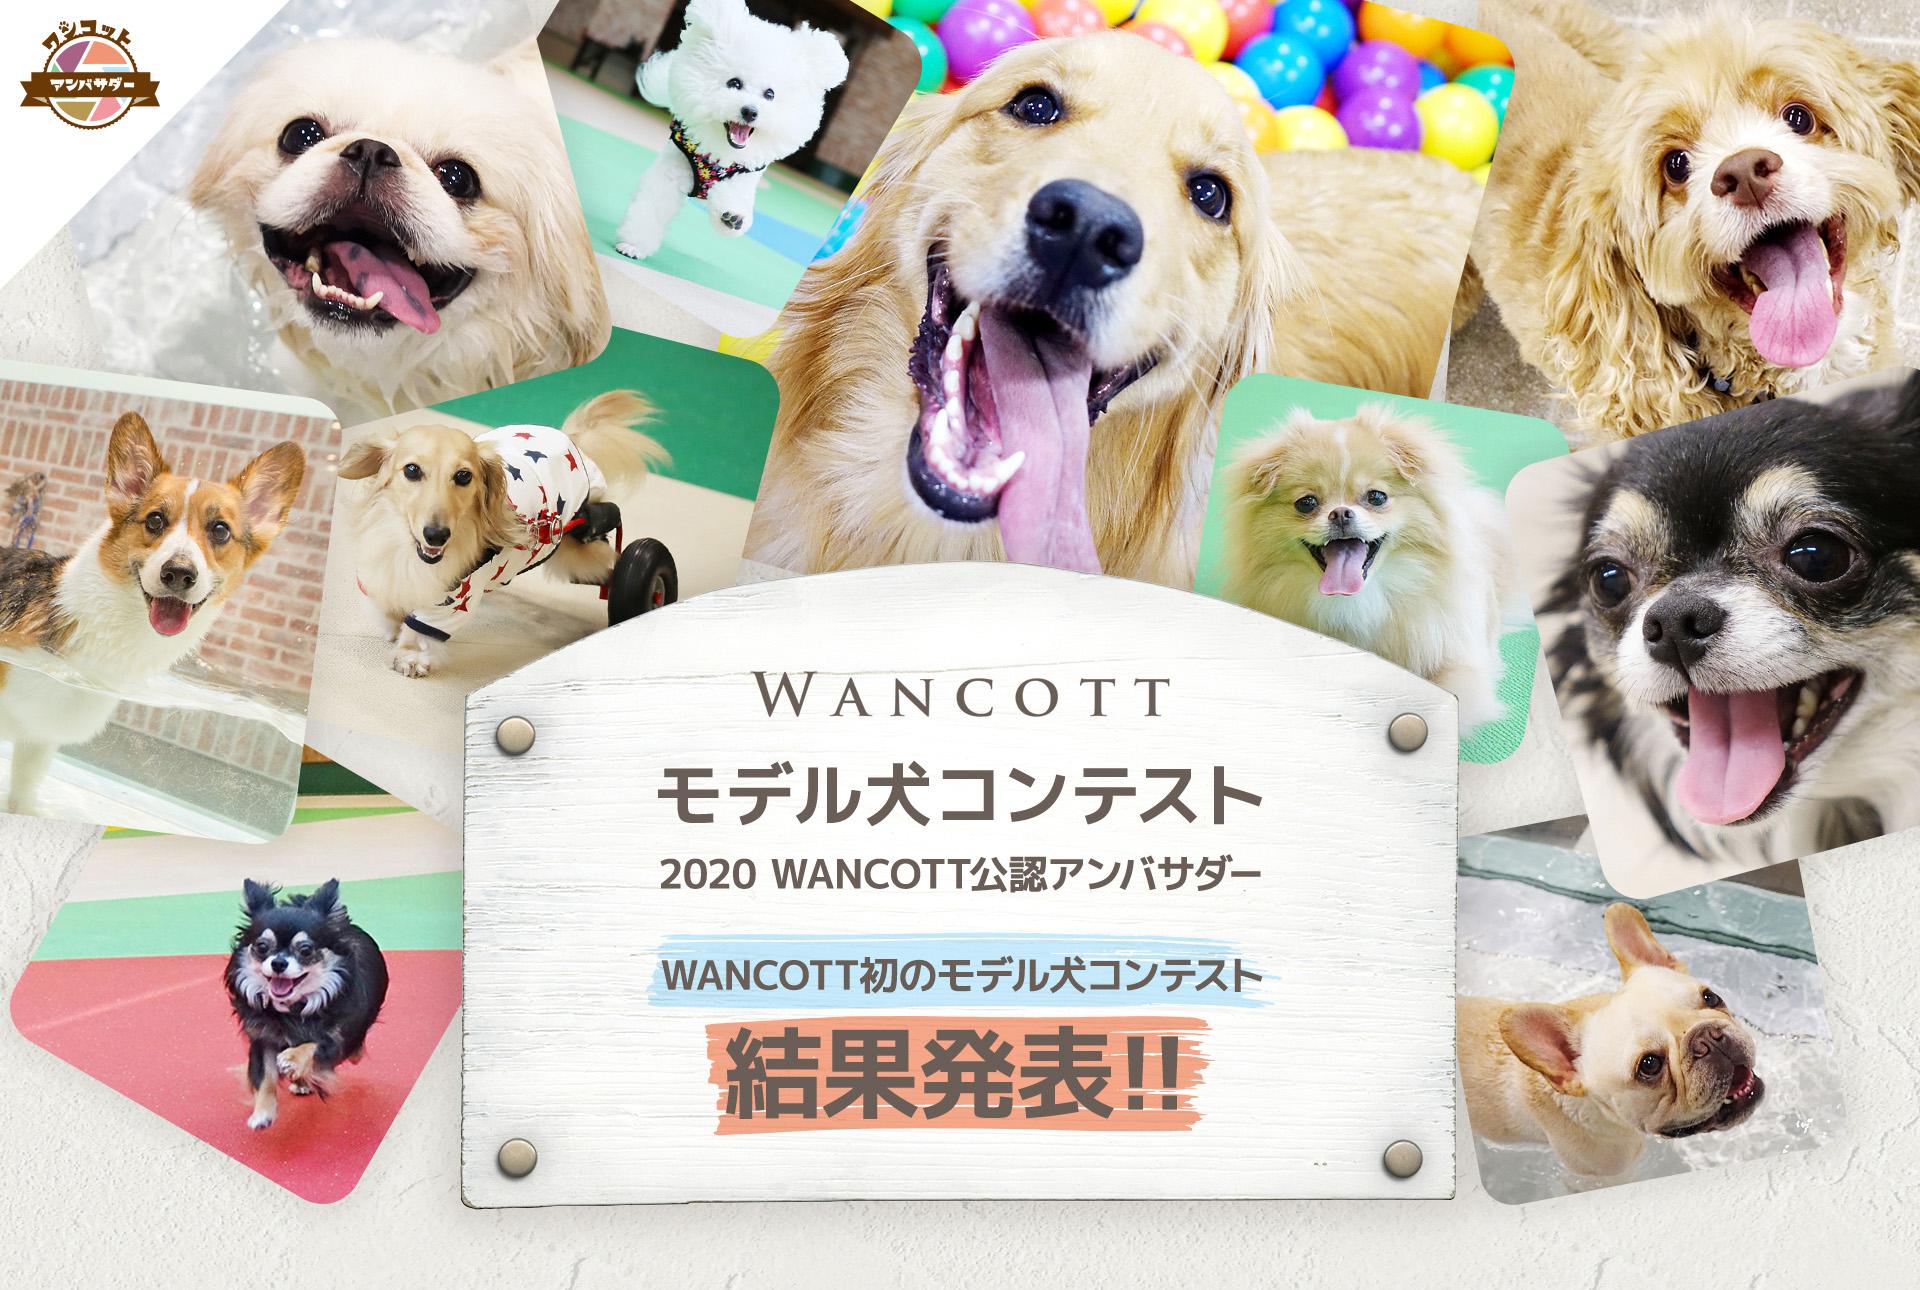 『WANCOTTモデル犬 コンテスト』~2020 WANCOTT公認アンバサダー~ 結果発表!